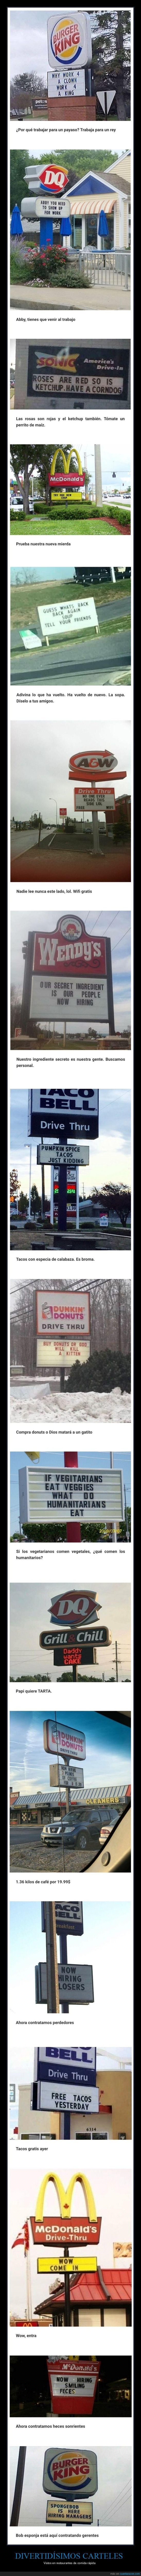 carteles,comida rápida,restaurantes